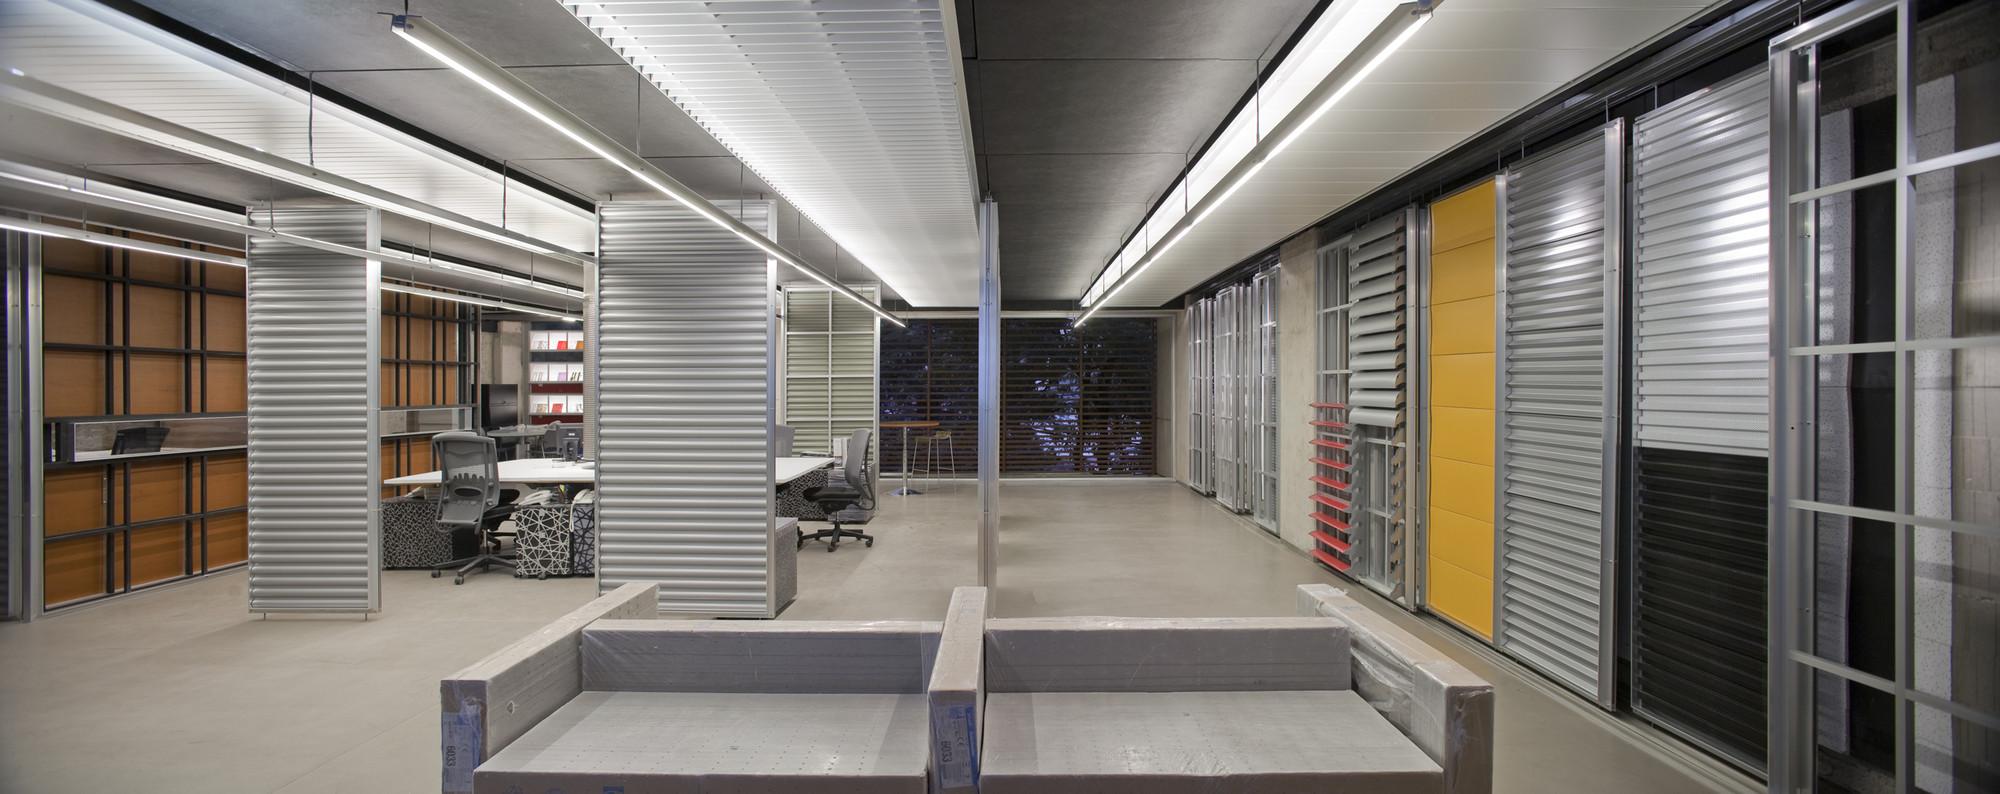 Showroom hunter douglas serrano monjaraz arquitectos - Arquitecto de interiores ...